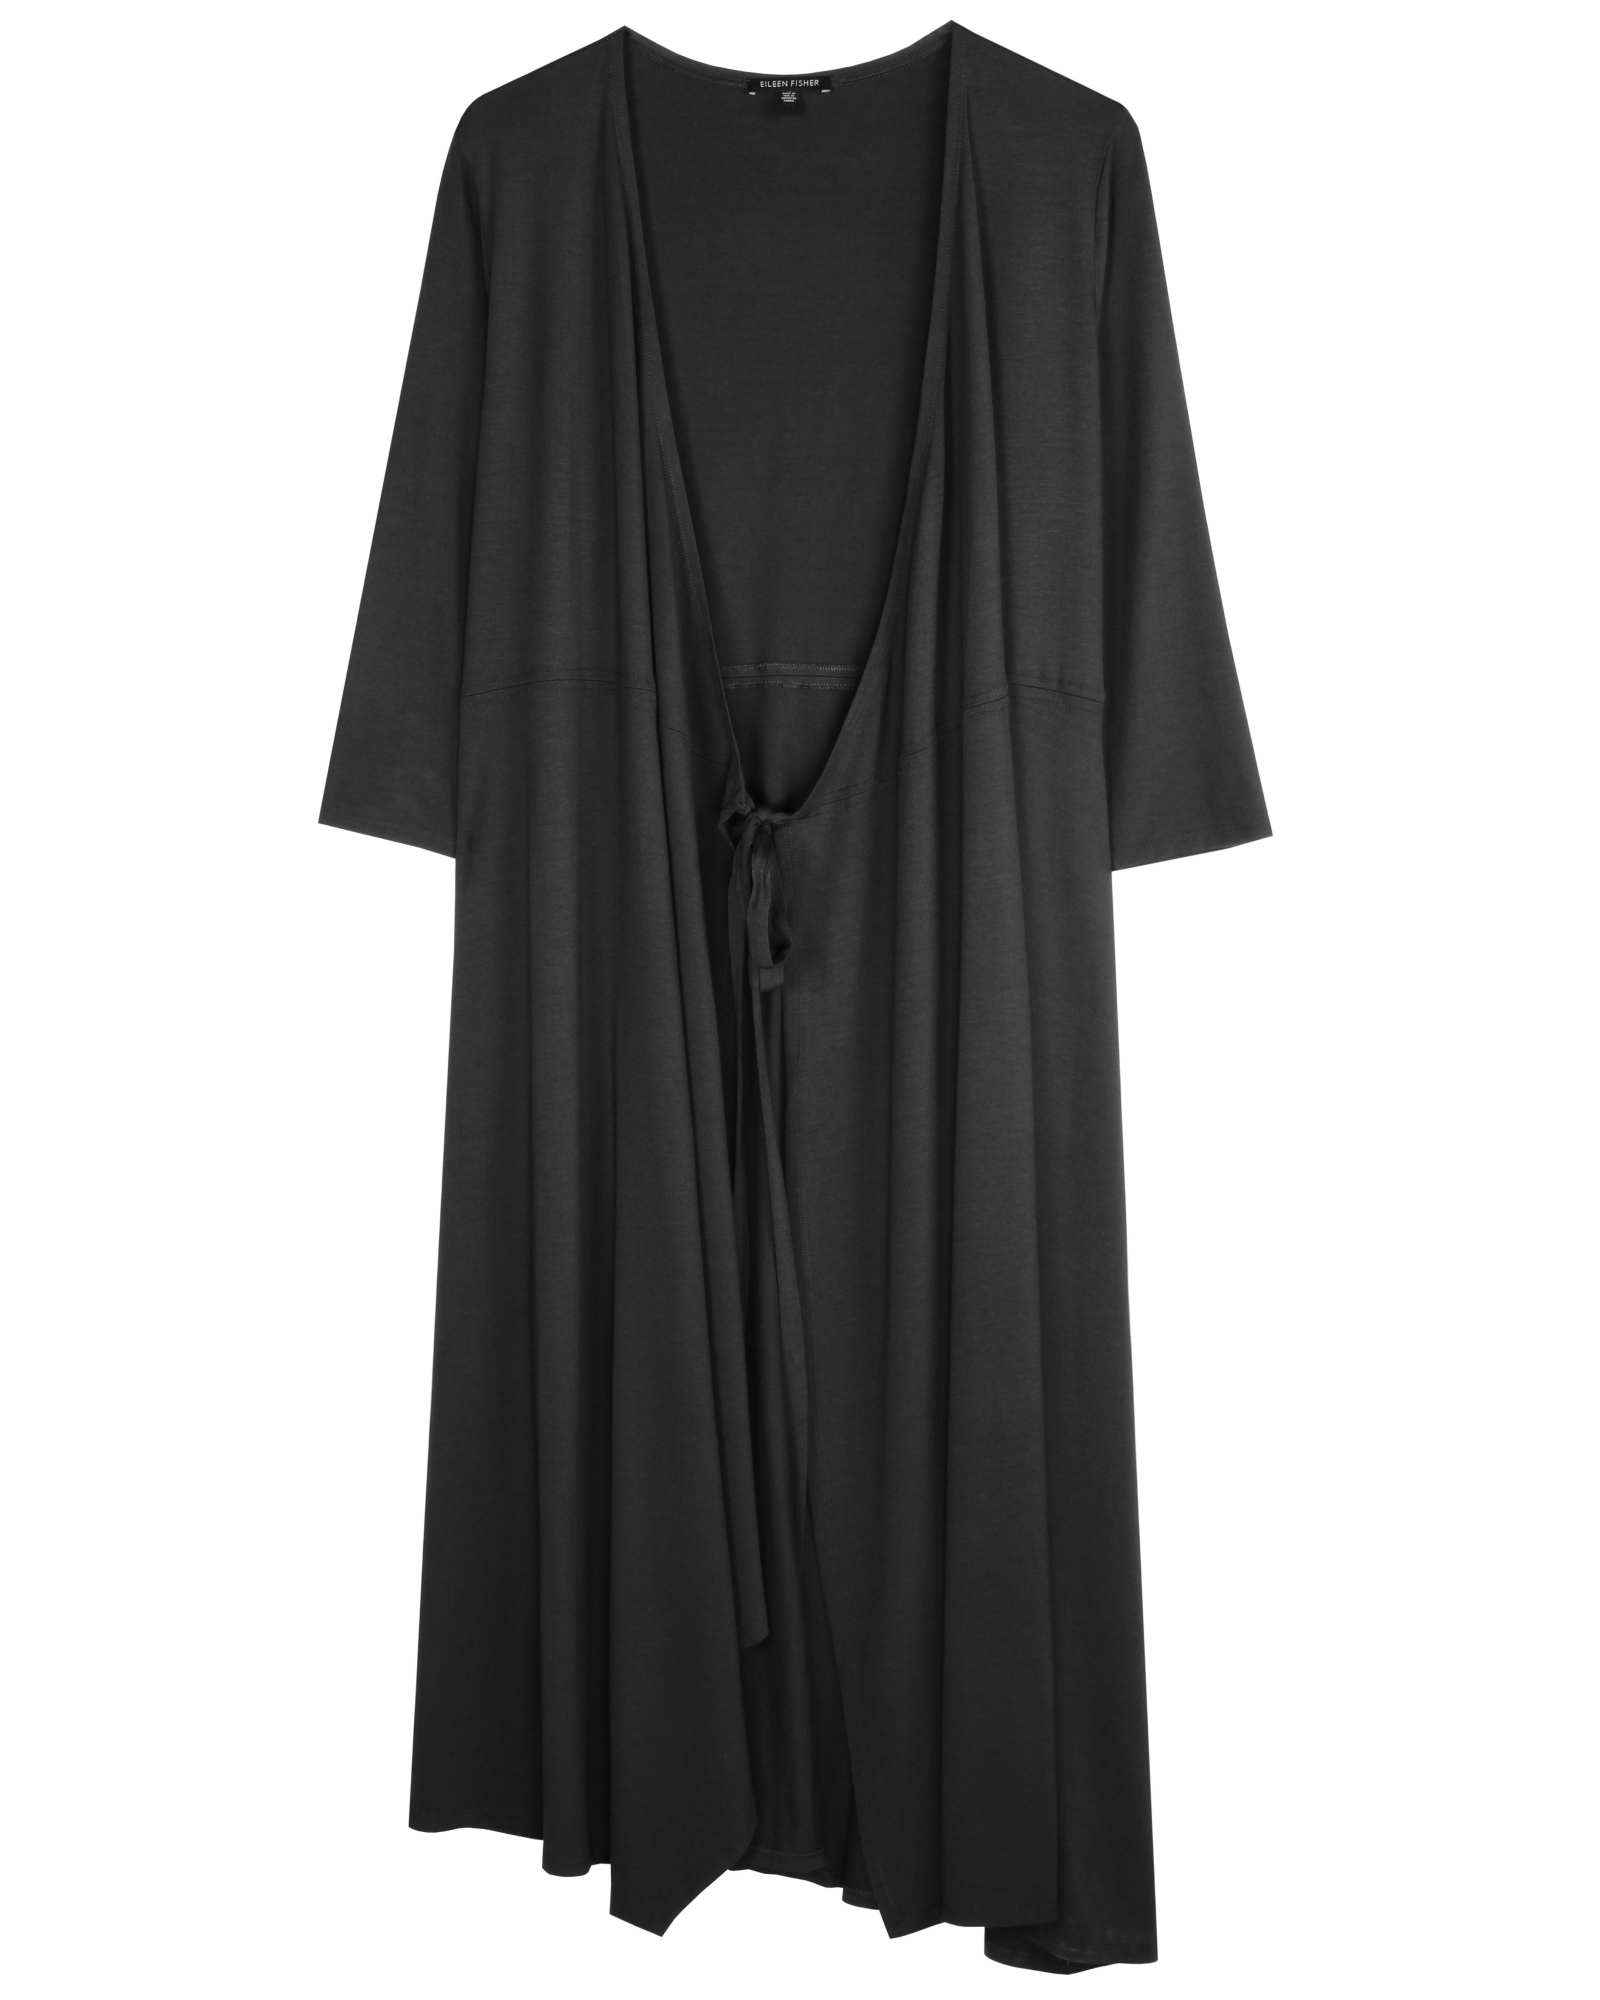 f288dc55620 Used Viscose Jersey Dress Grey